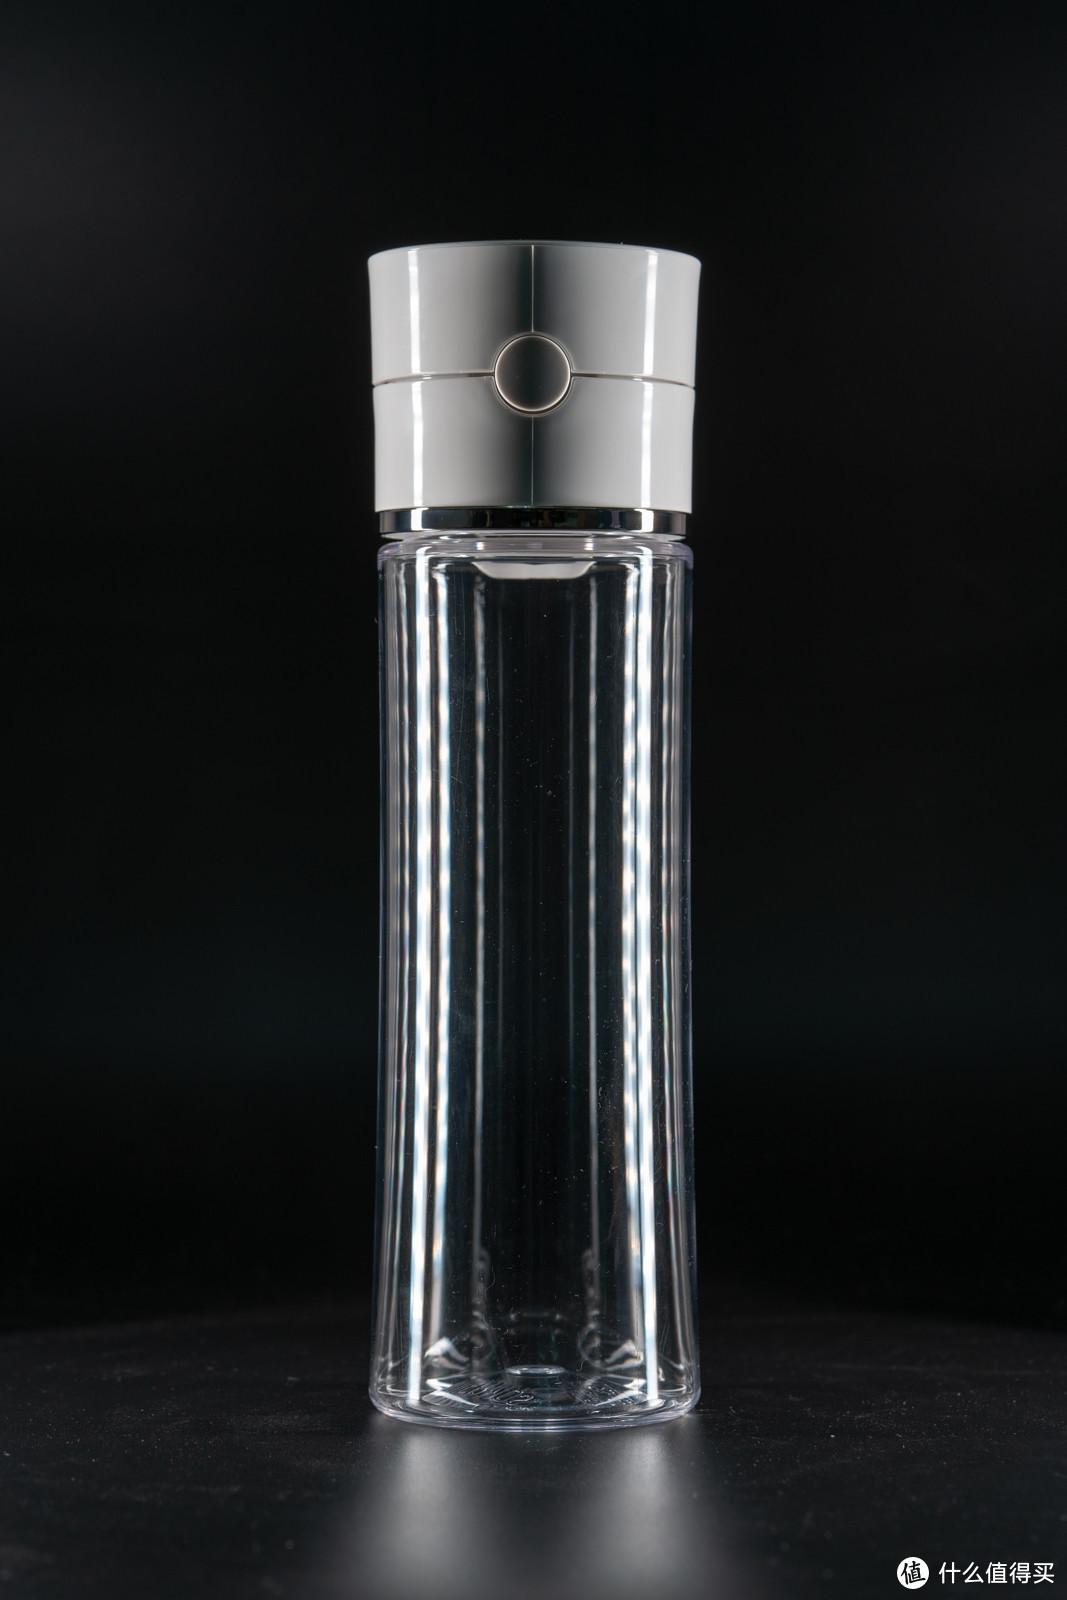 THERMOS 膳魔师 Tritan Hydration 单手开启透明水杯开箱